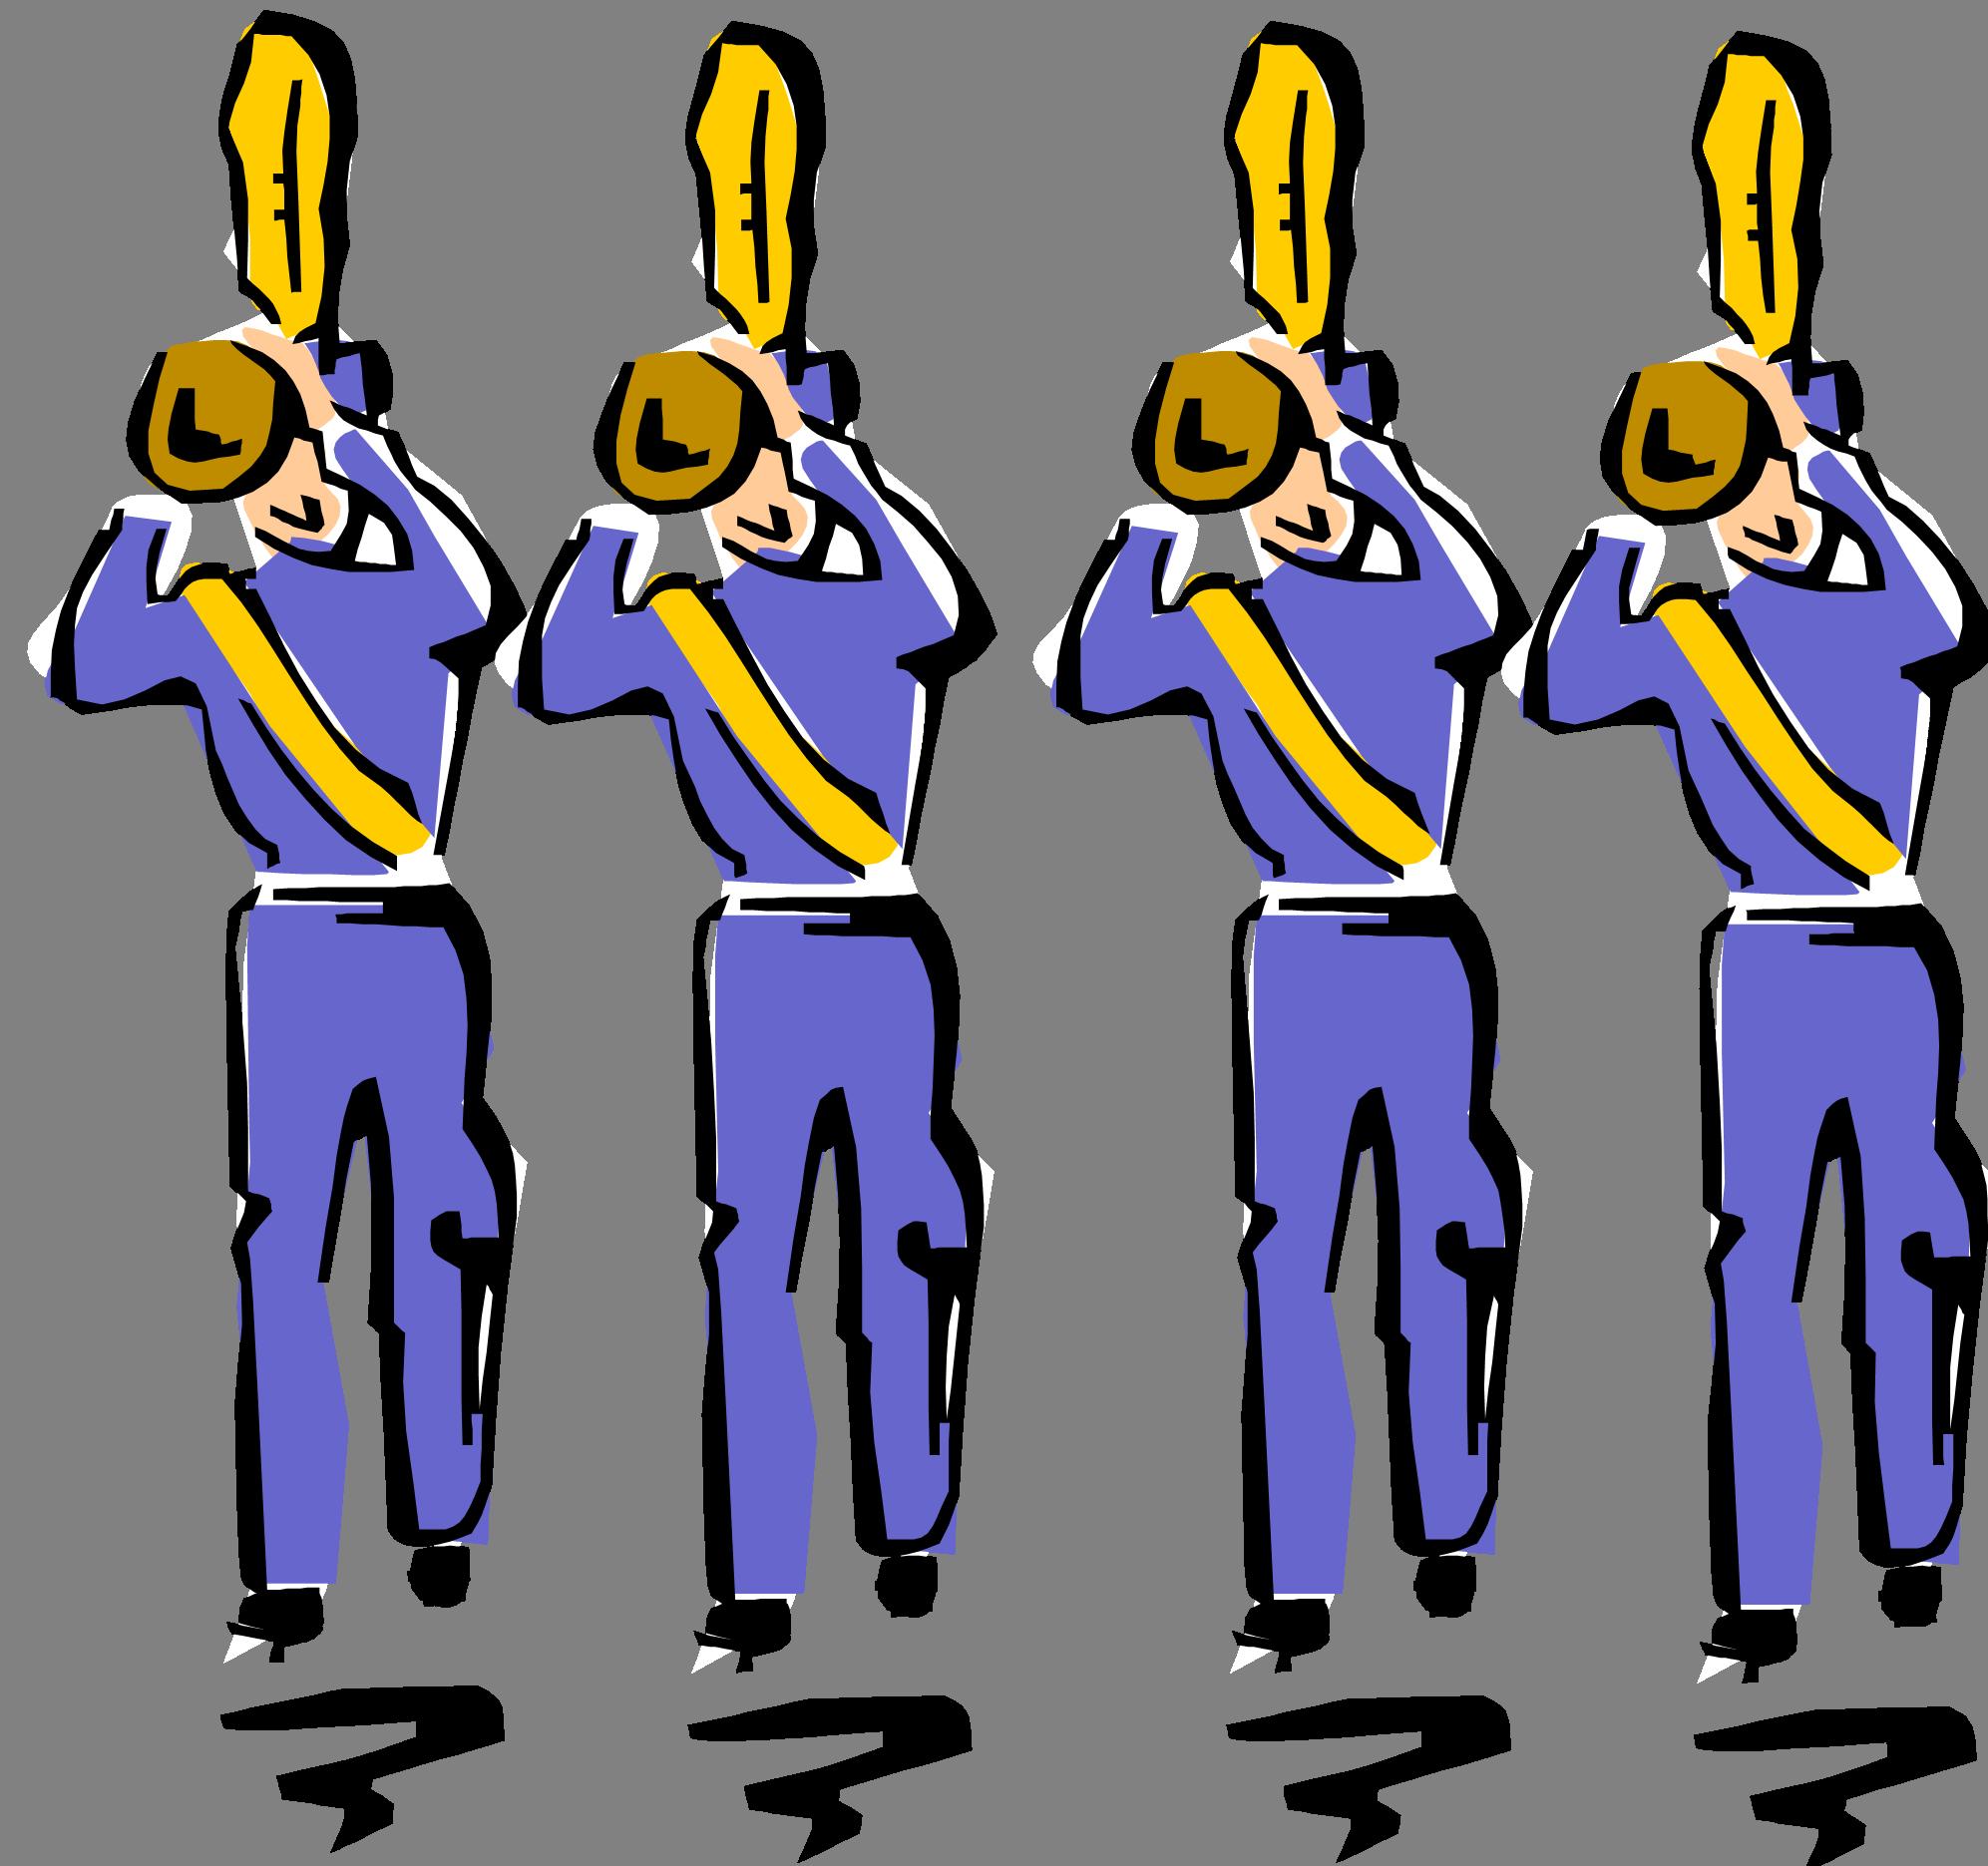 School chorus clipart jpg freeuse Free School Band Cliparts, Download Free Clip Art, Free Clip Art on ... jpg freeuse